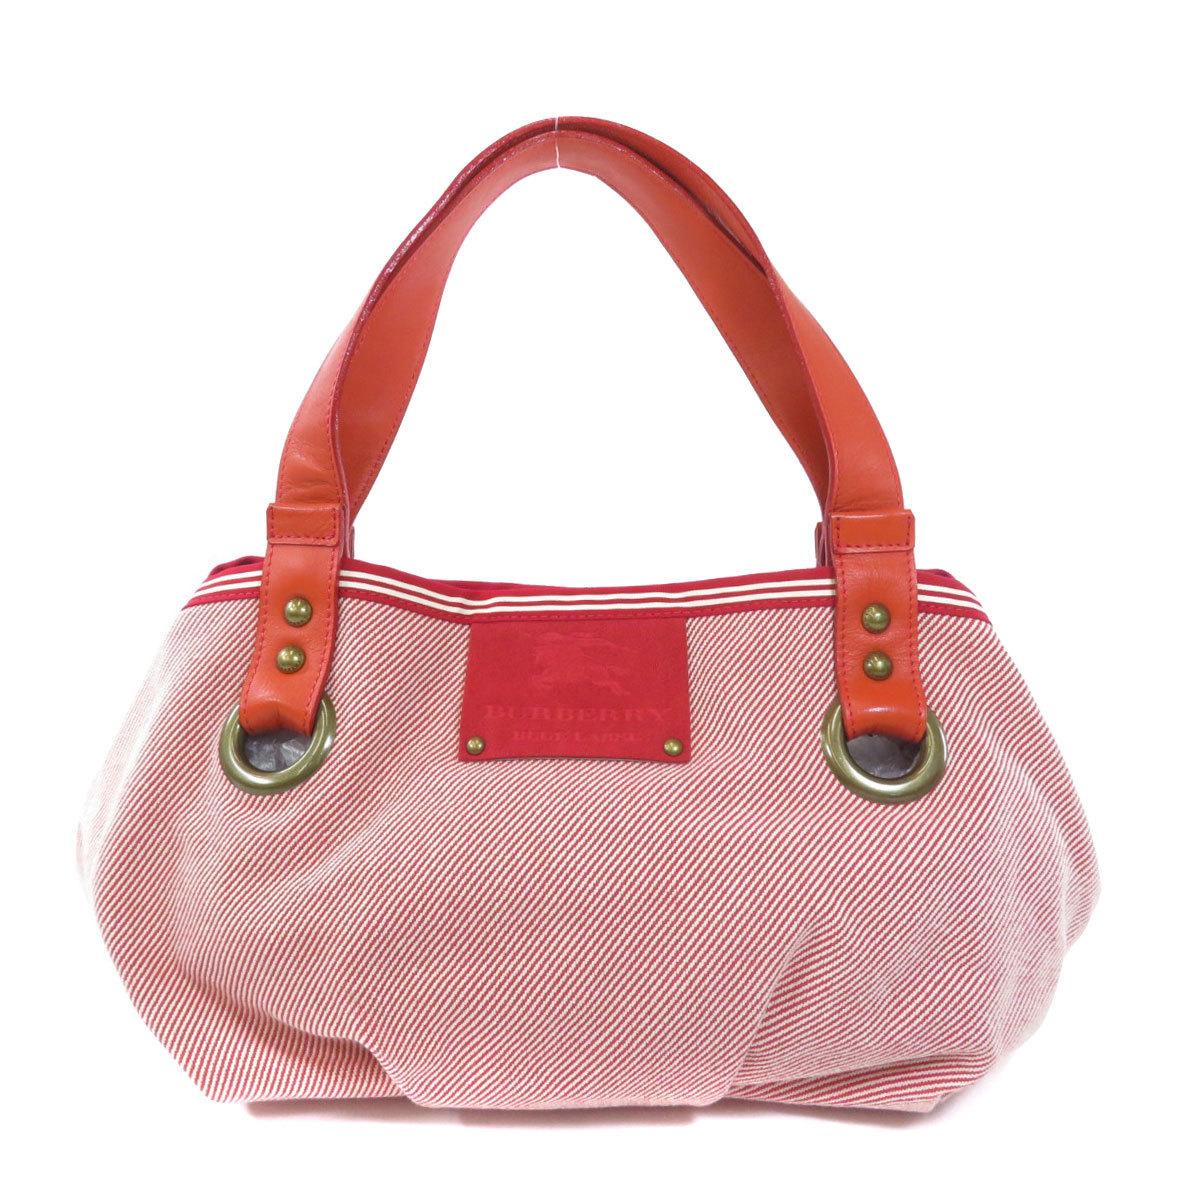 Burberry Logo Motif Tote Bag Canvas Ladies